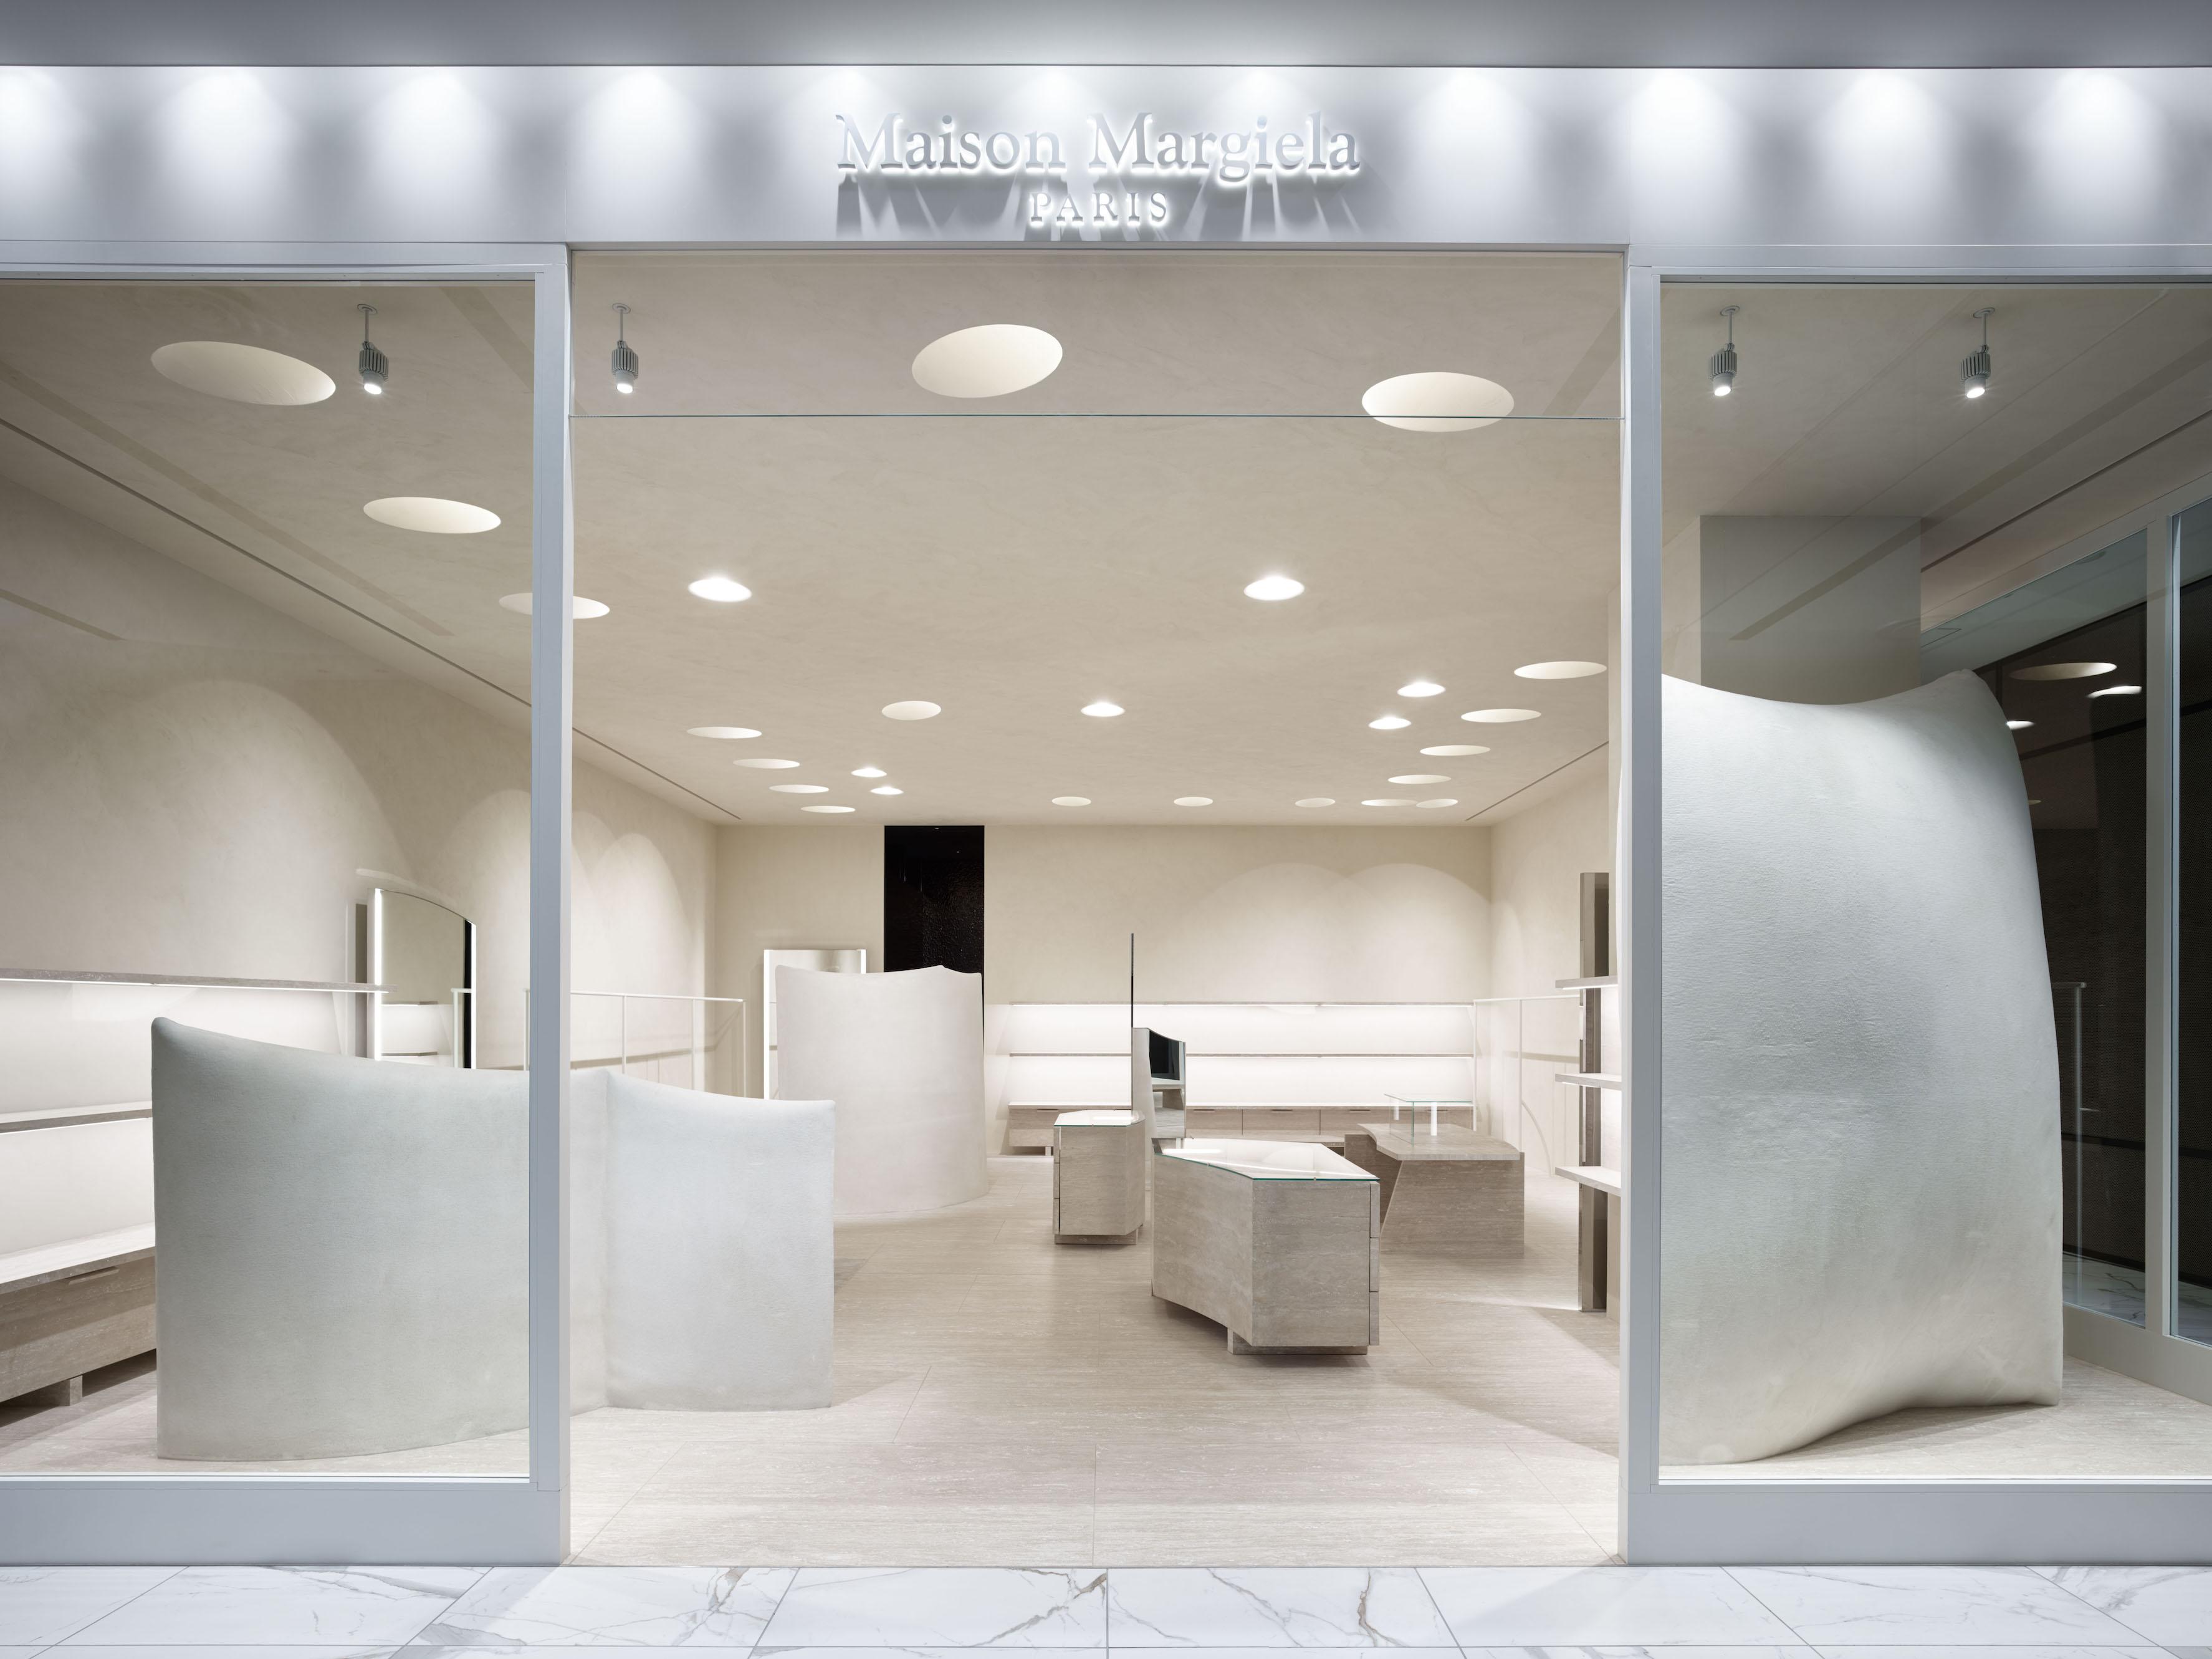 Maison Margiela日本初・新コンセプトの旗艦店オープン